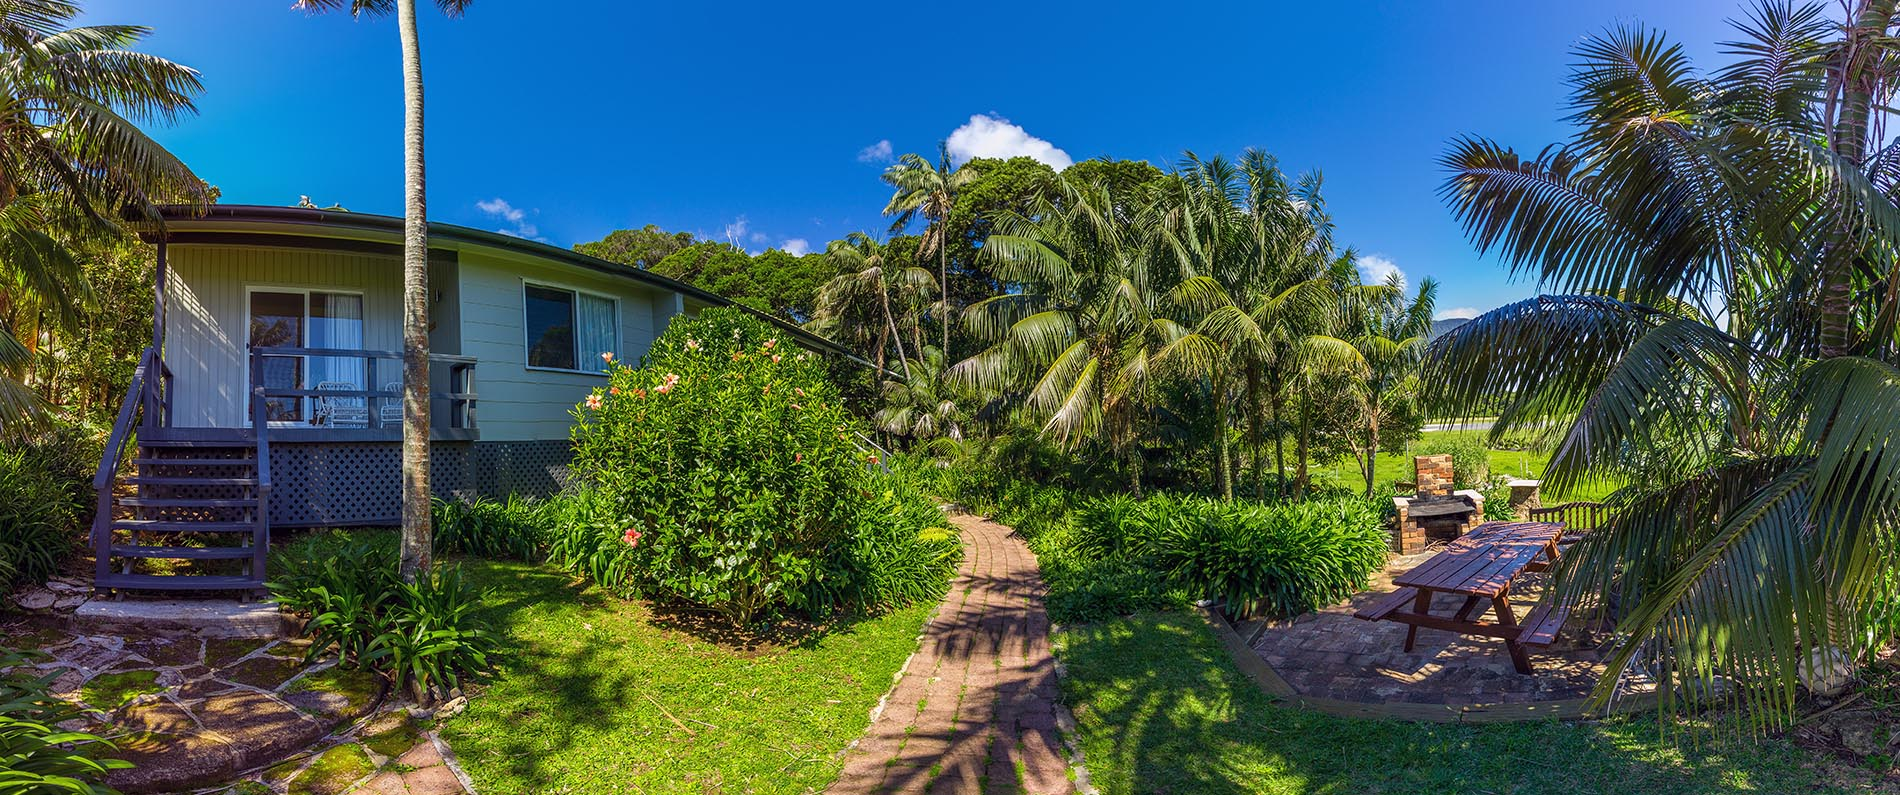 Lord Howe Island  Bedroom Accommodation